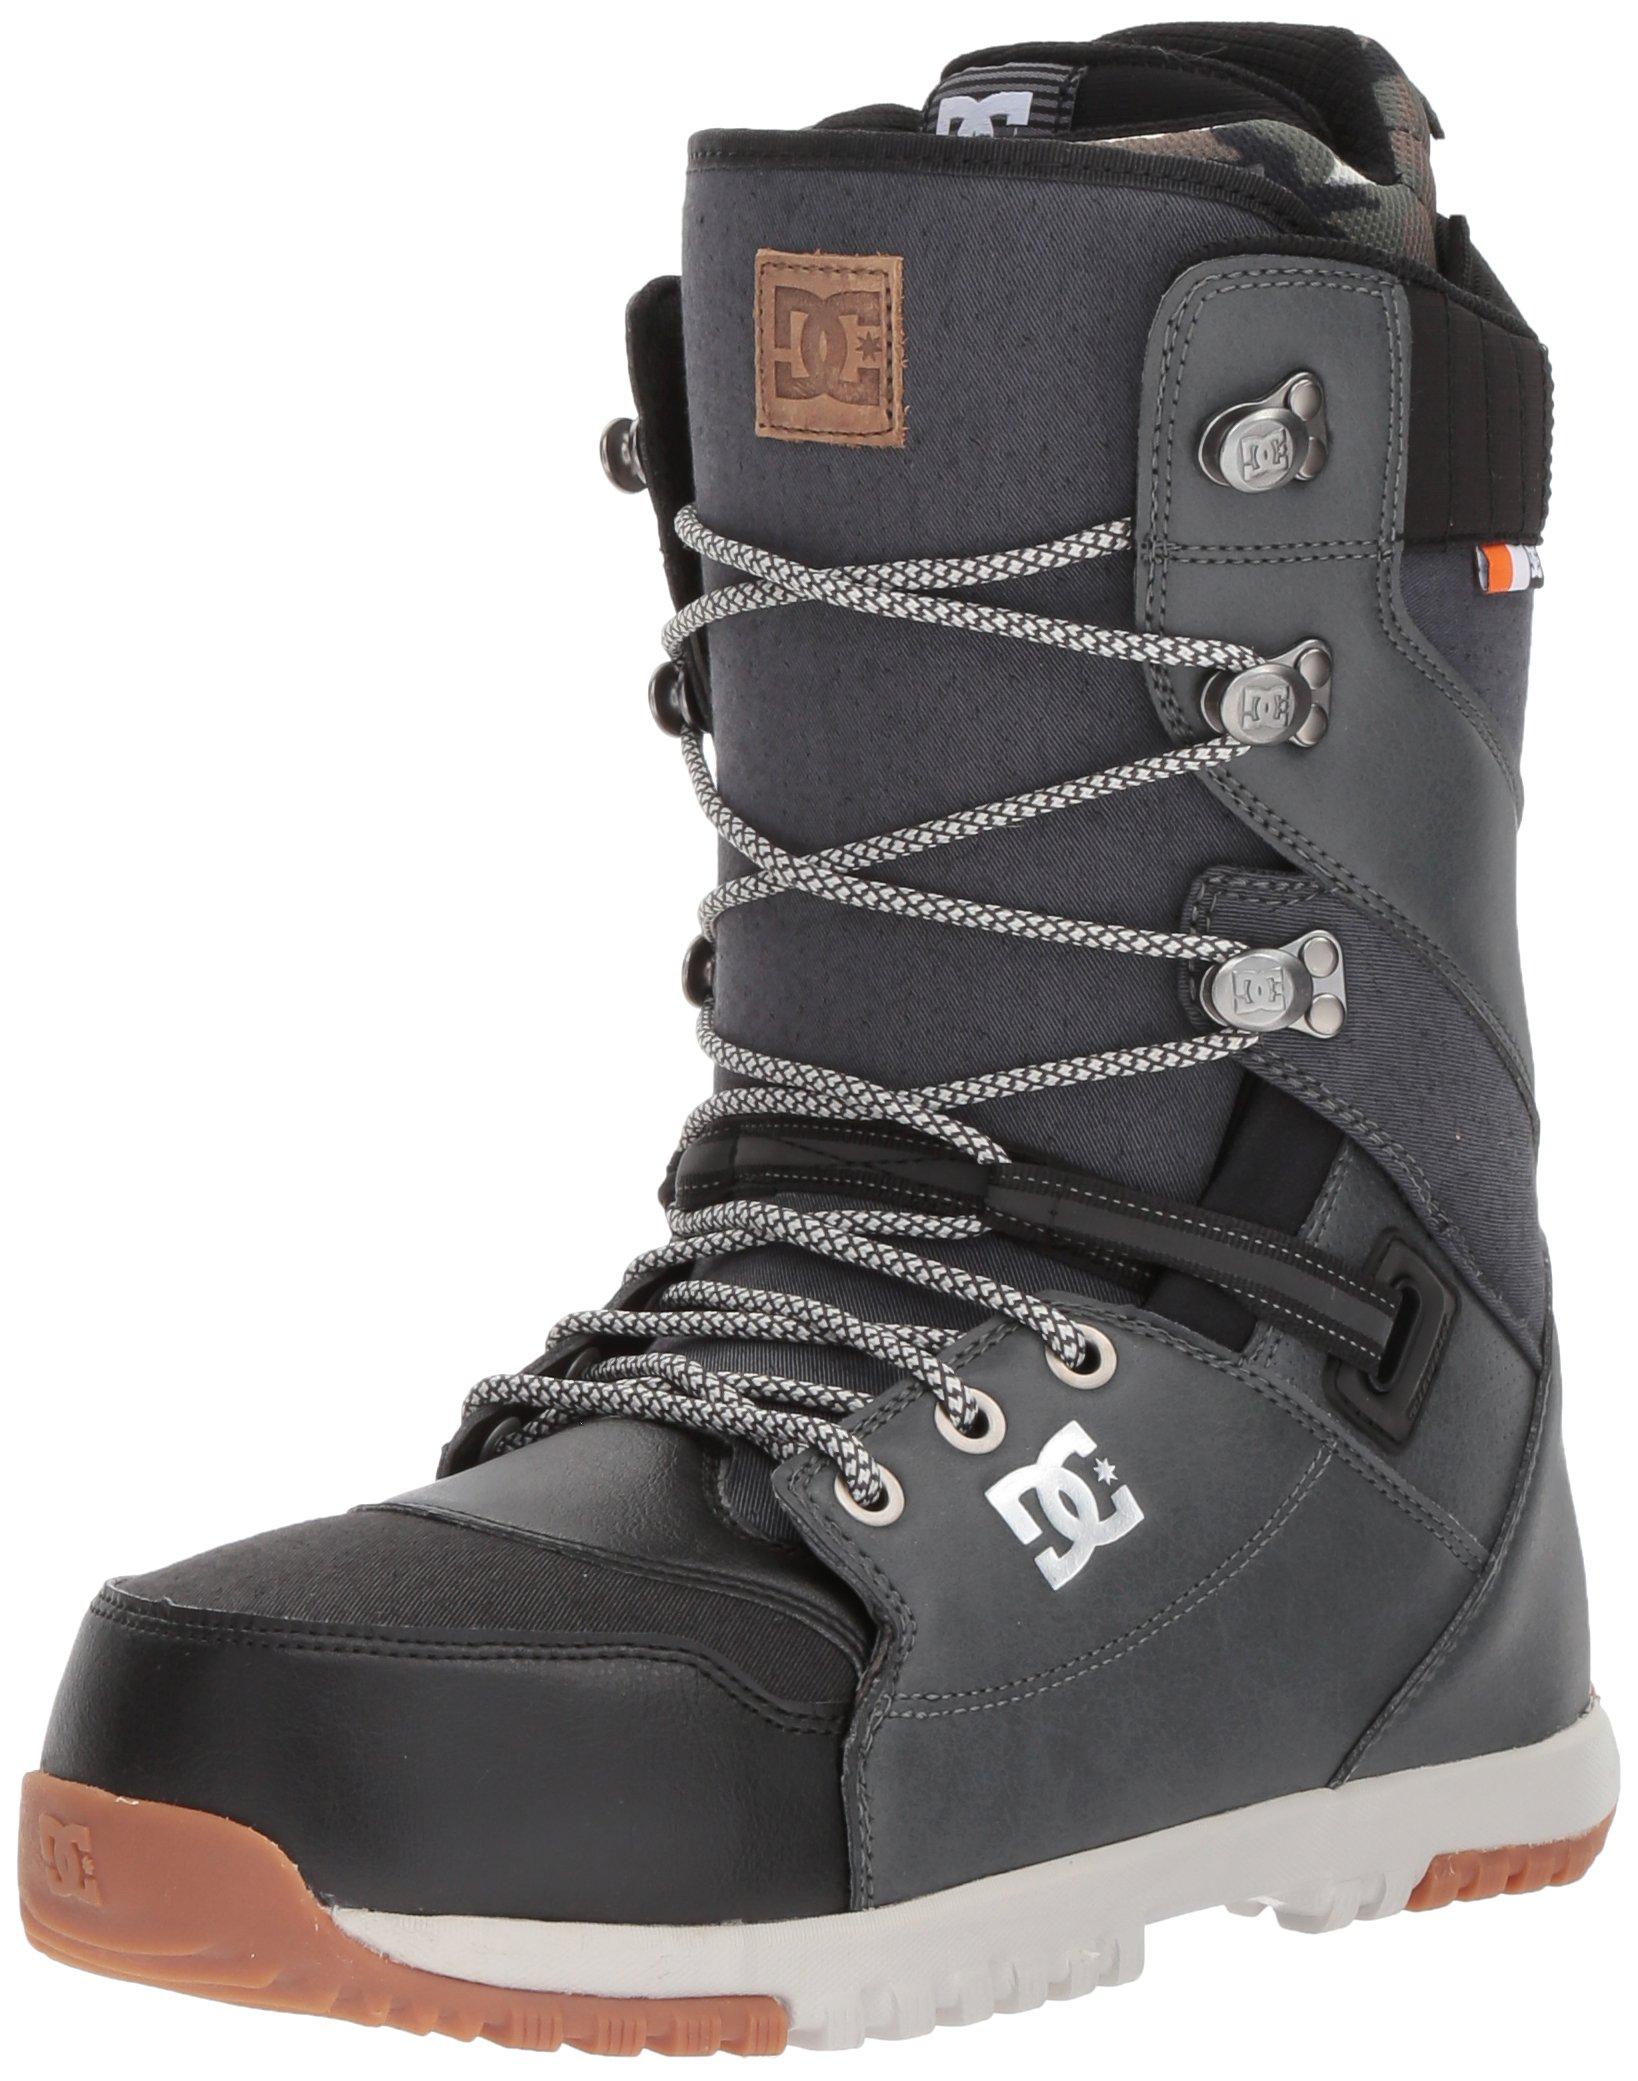 DC Men's Mutiny Lace Snowboard Boots